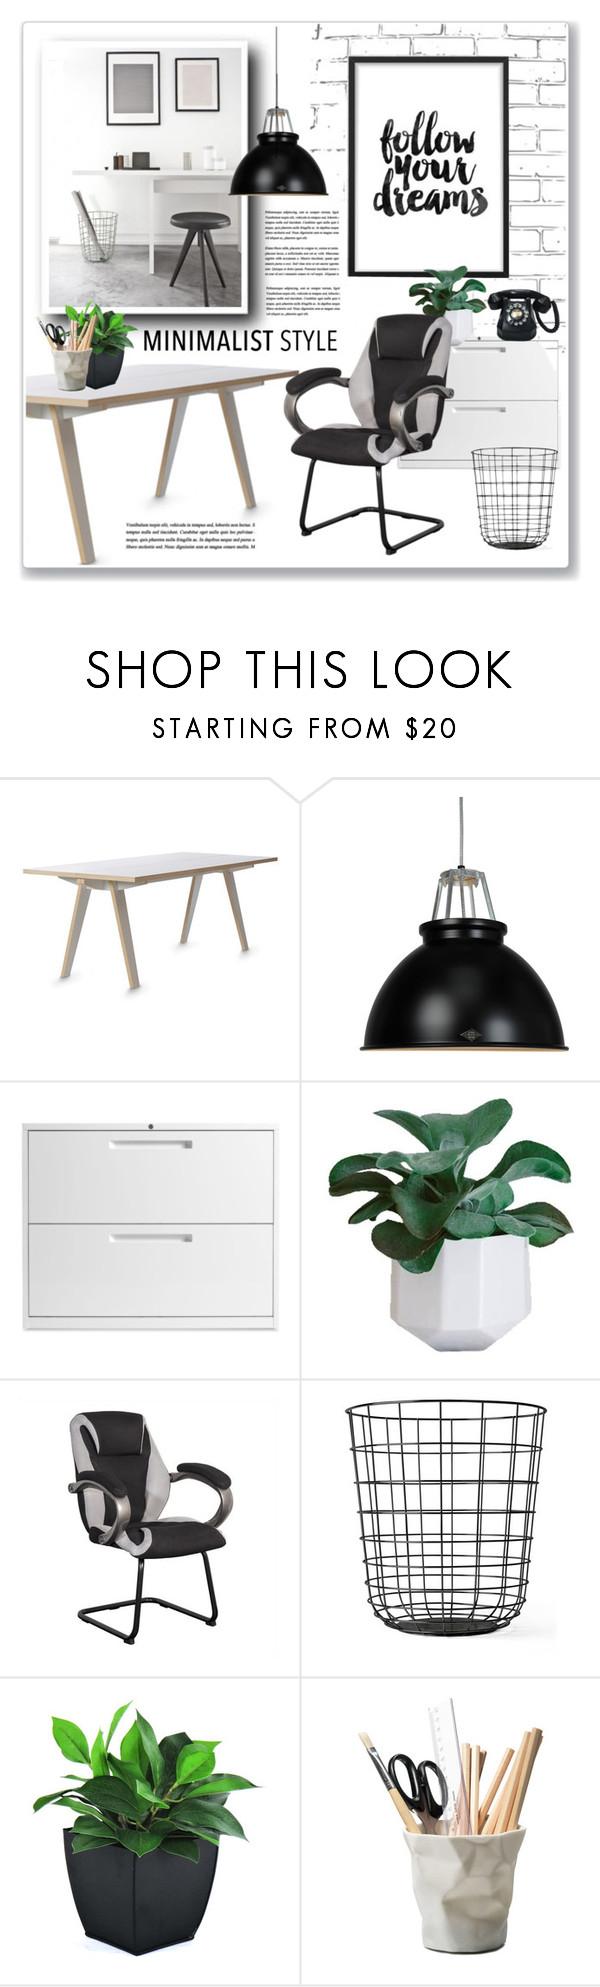 """minimalist officce"" by nanawidia ❤ liked on Polyvore featuring interior, interiors, interior design, home, home decor, interior decorating, Original BTC, Blu Dot, Sonax and Menu"